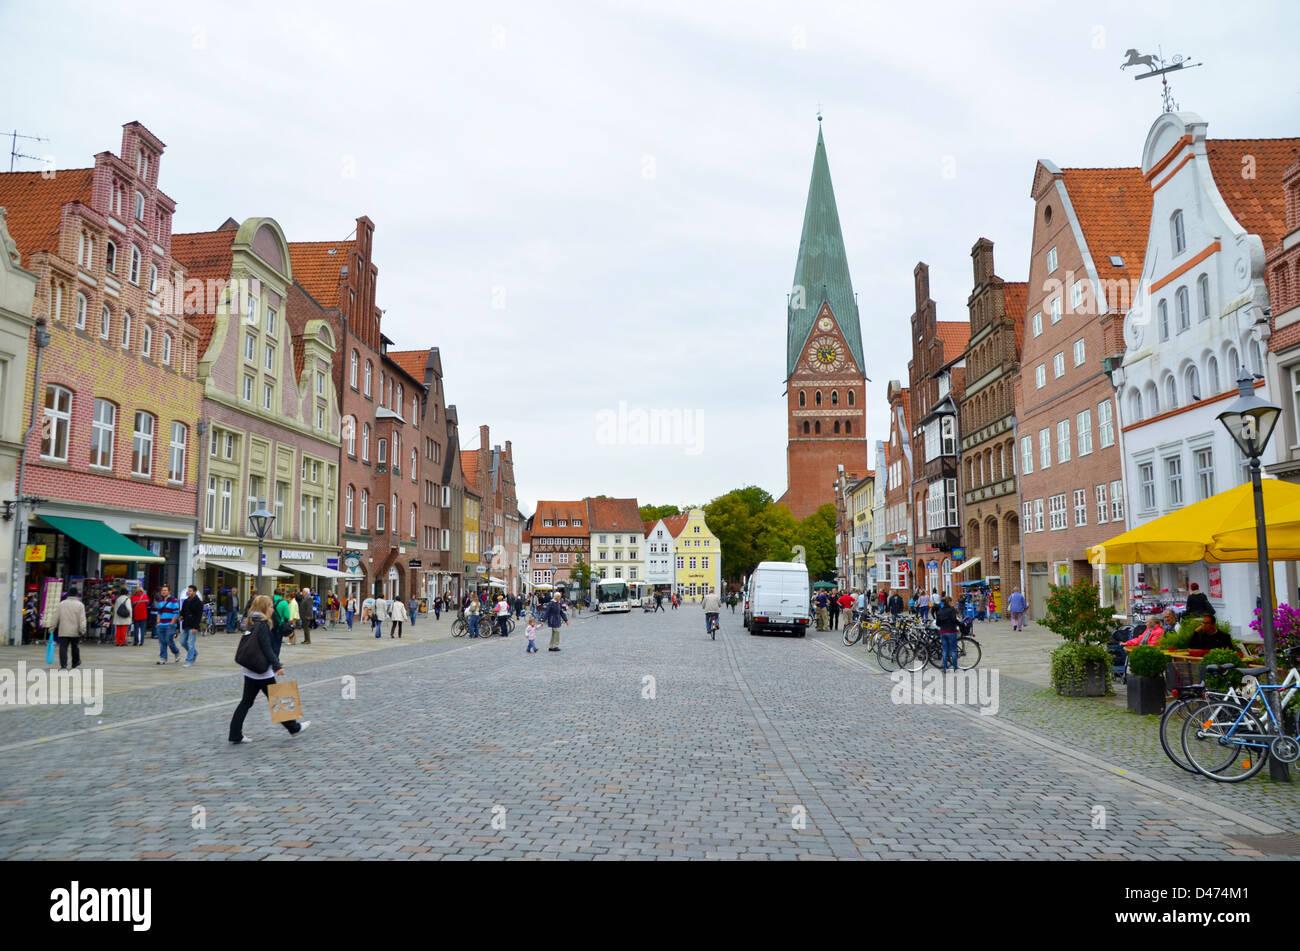 Germany, Lower Saxony, Stade - Stock Image